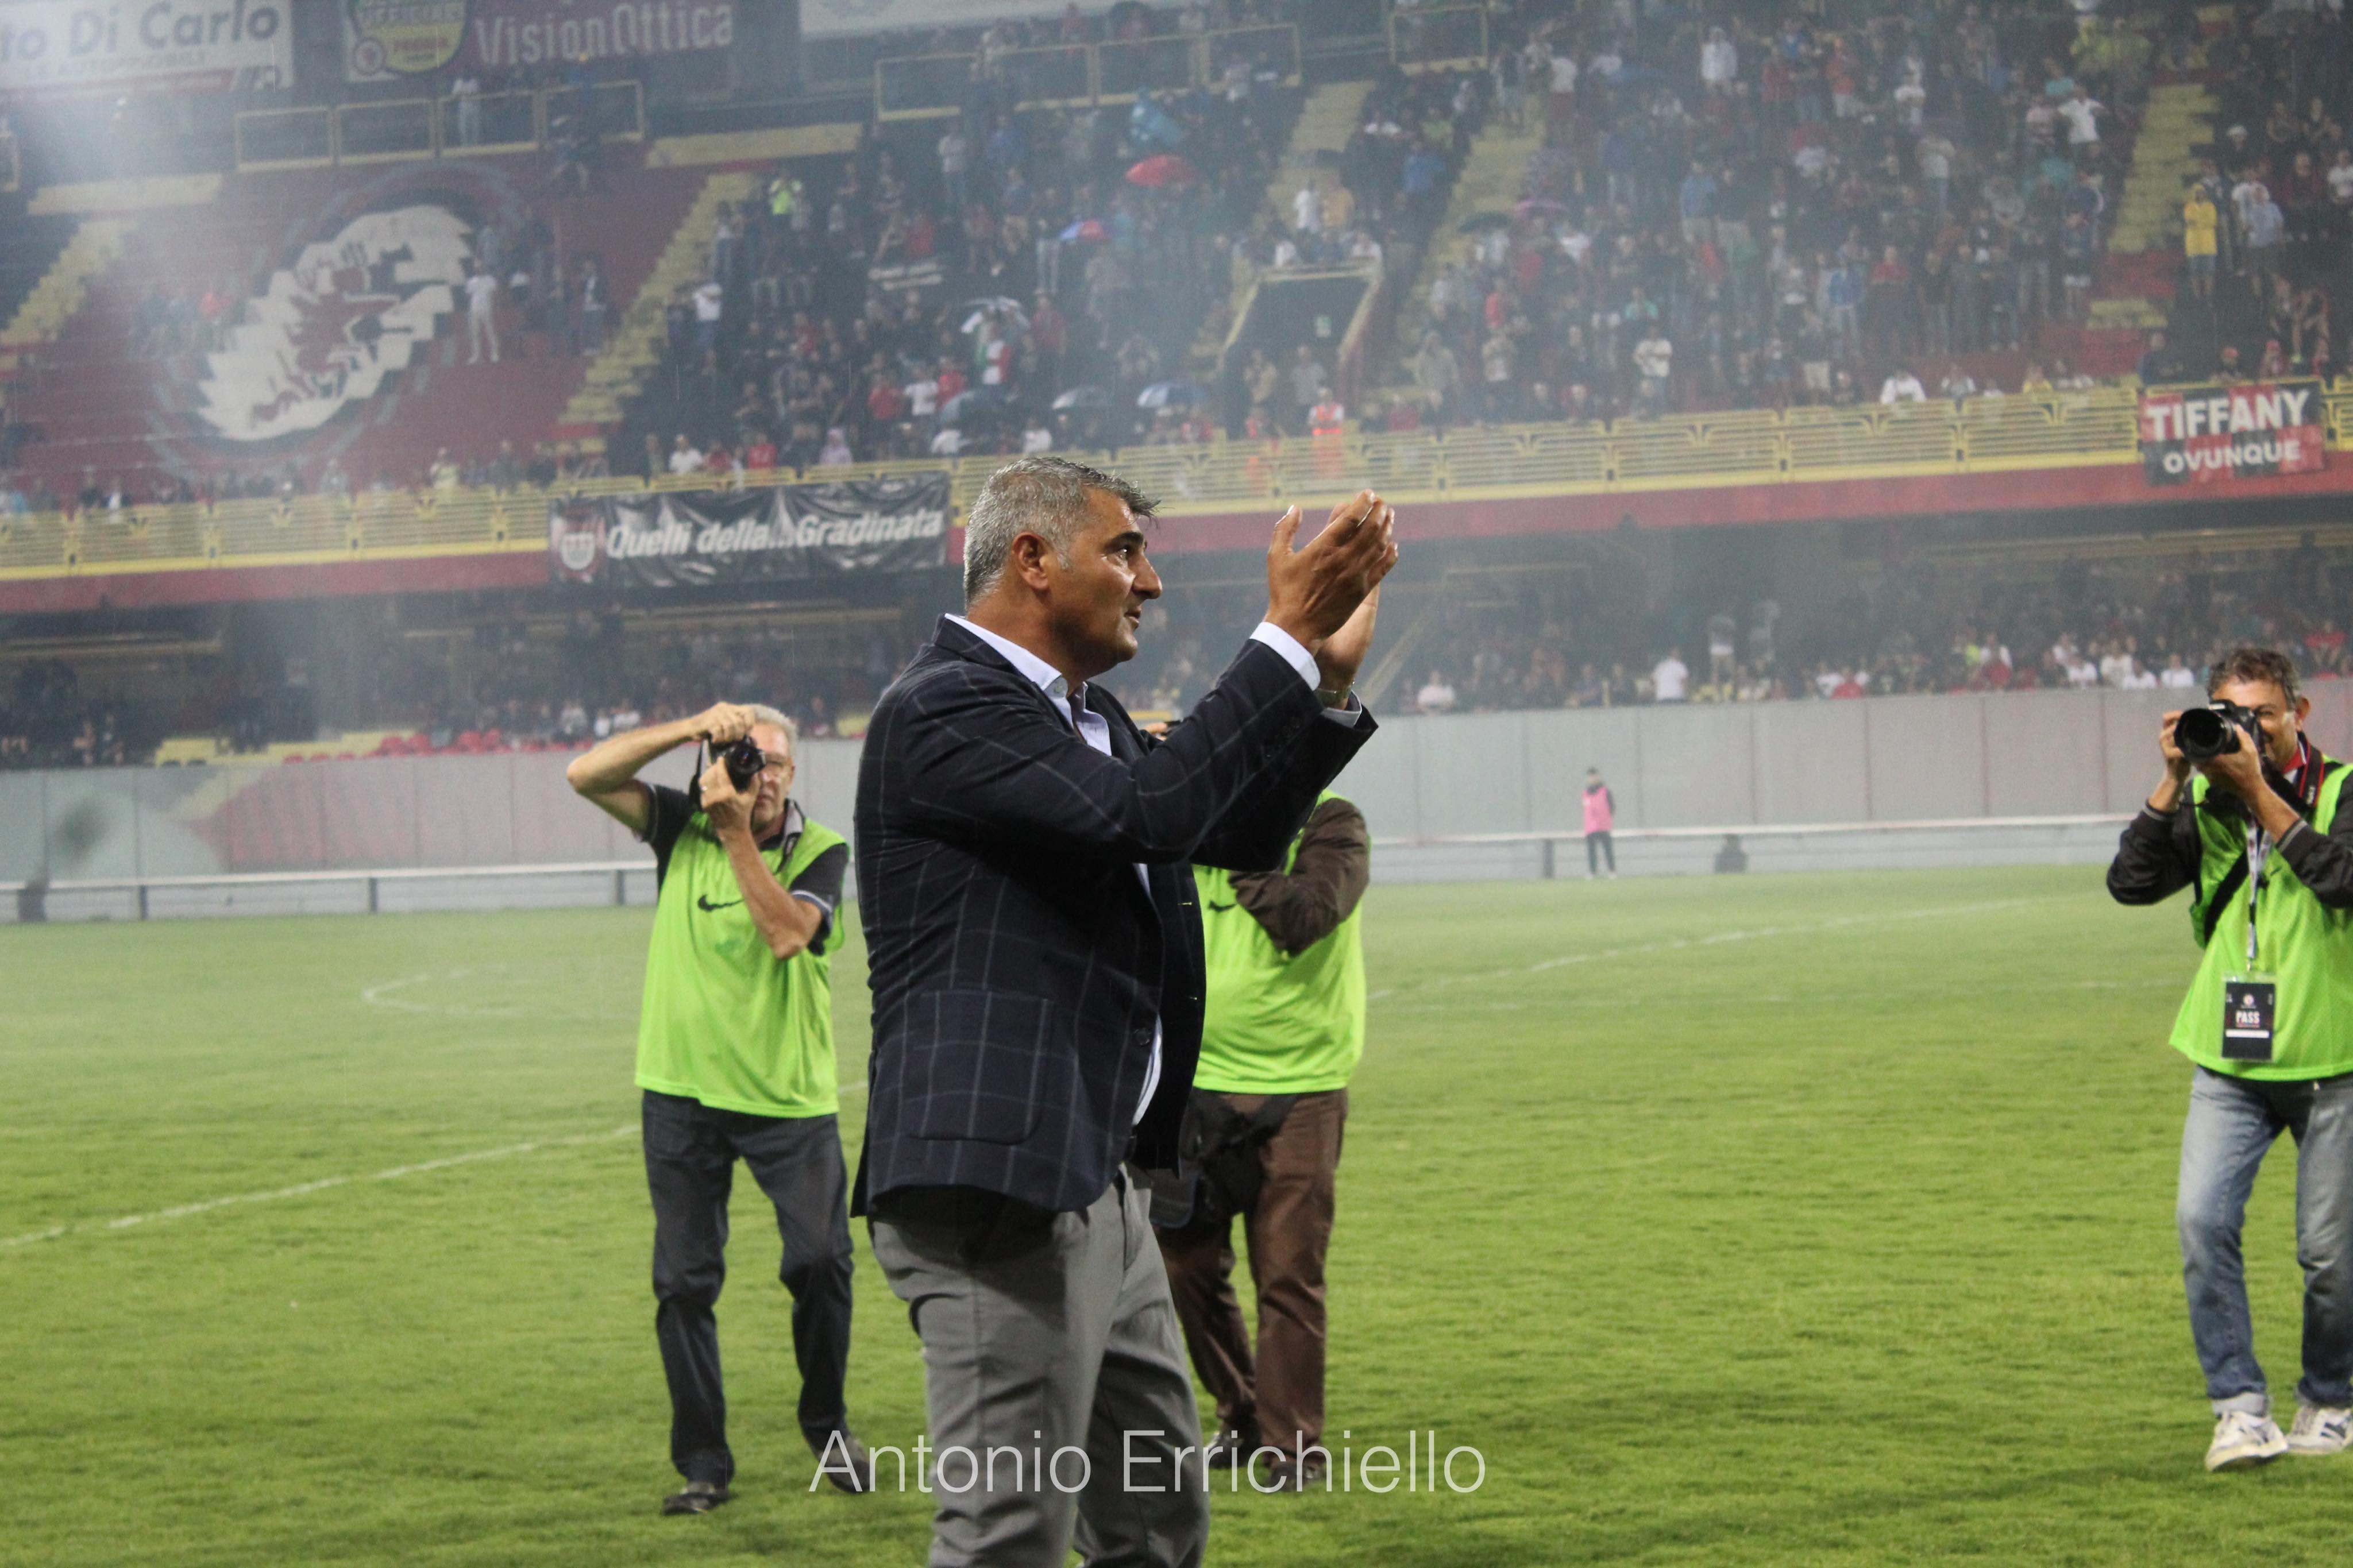 Roberto Felleca